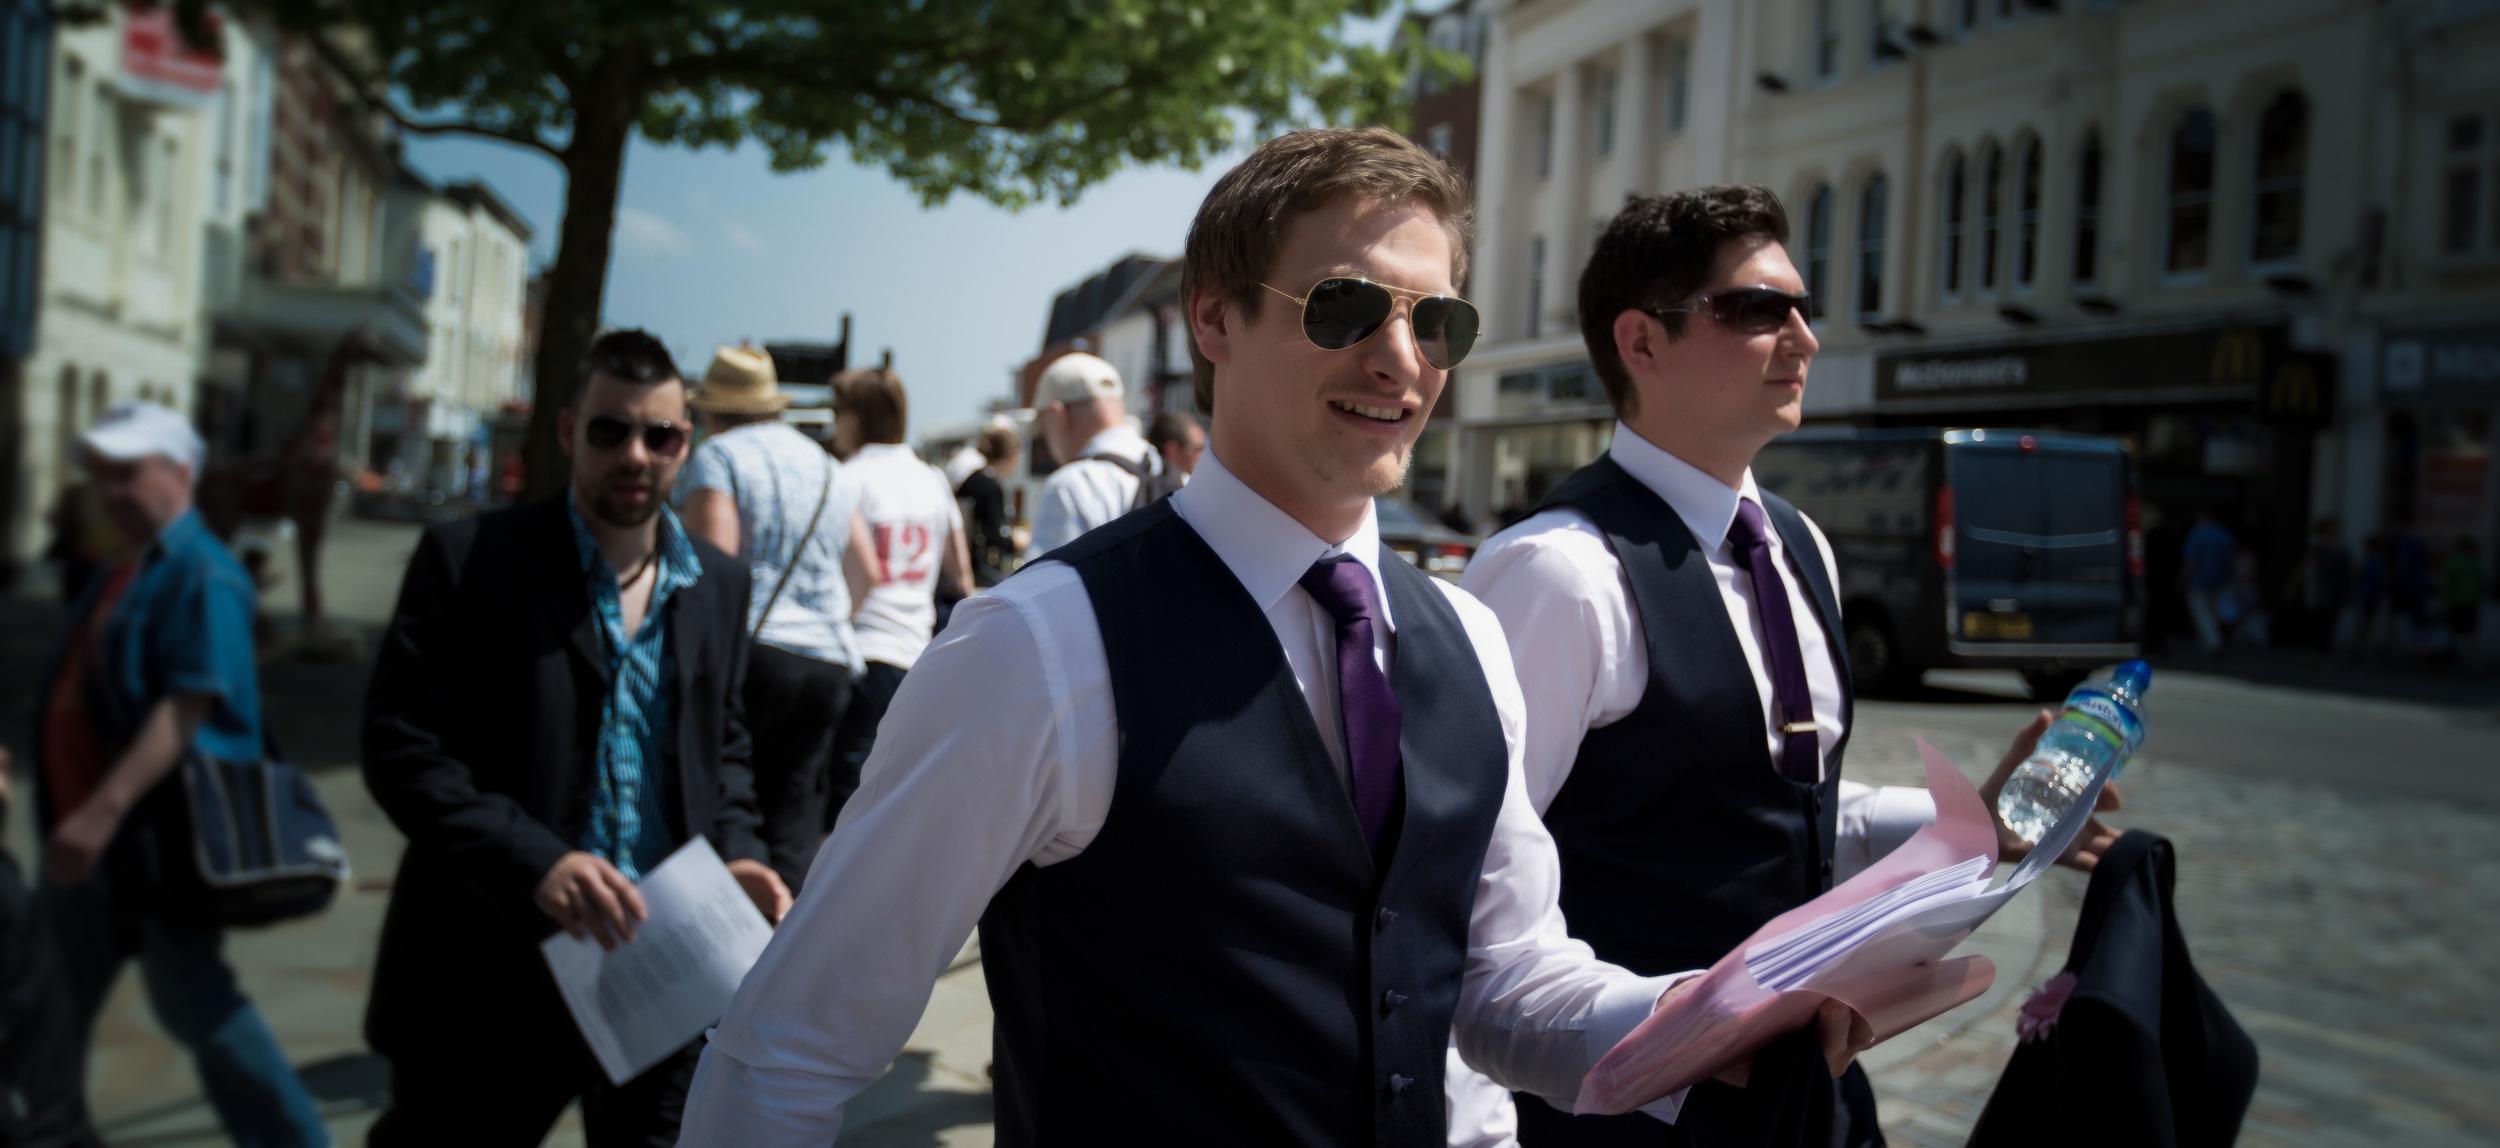 best-man-and-groom-essex-london-uk-destination-wedding-photography-Adam-Rowley